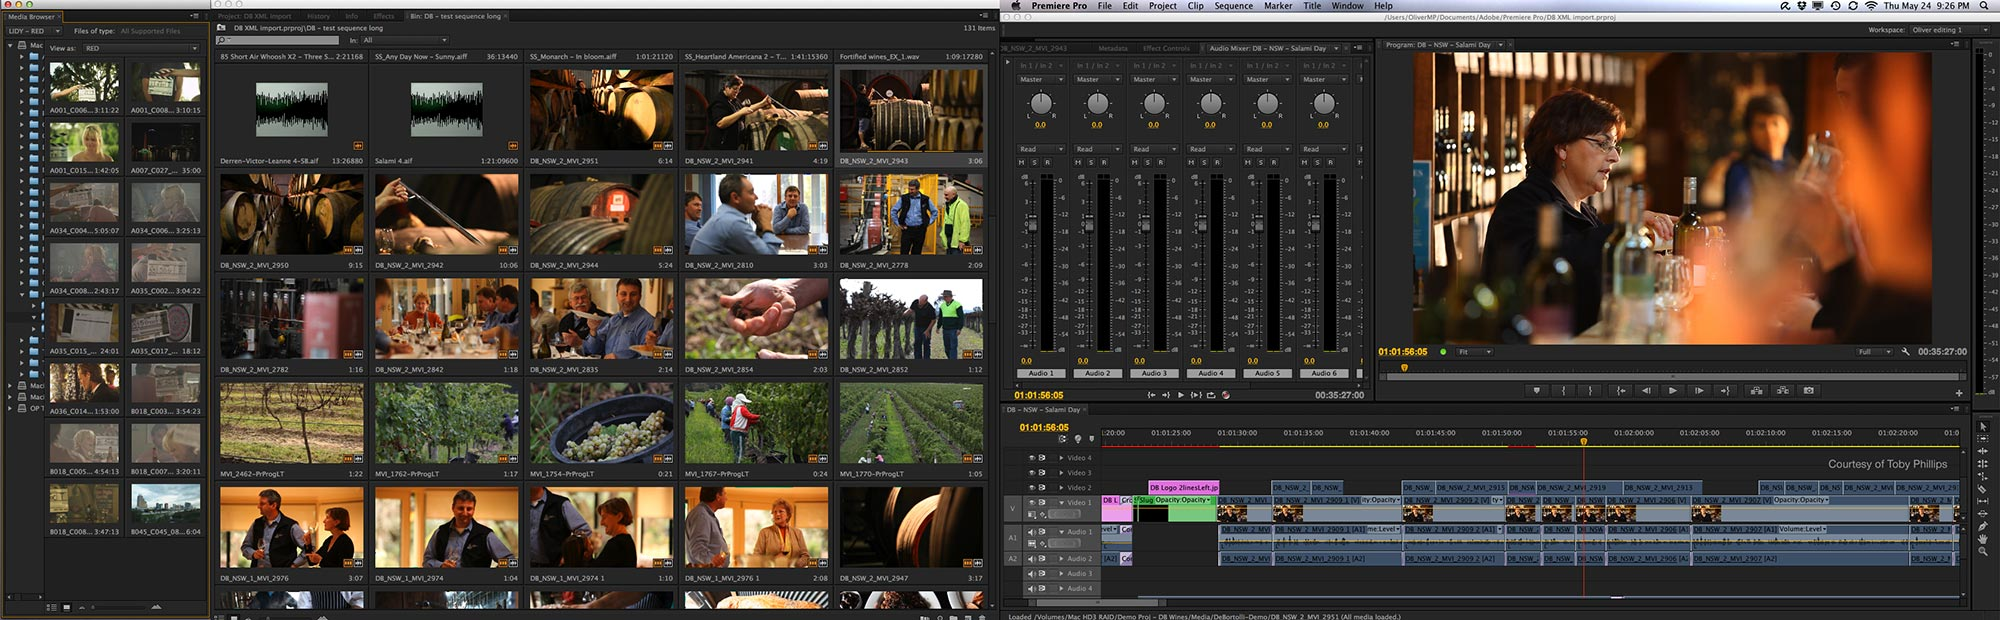 Adobe Premiere Pro CS6 « digitalfilms